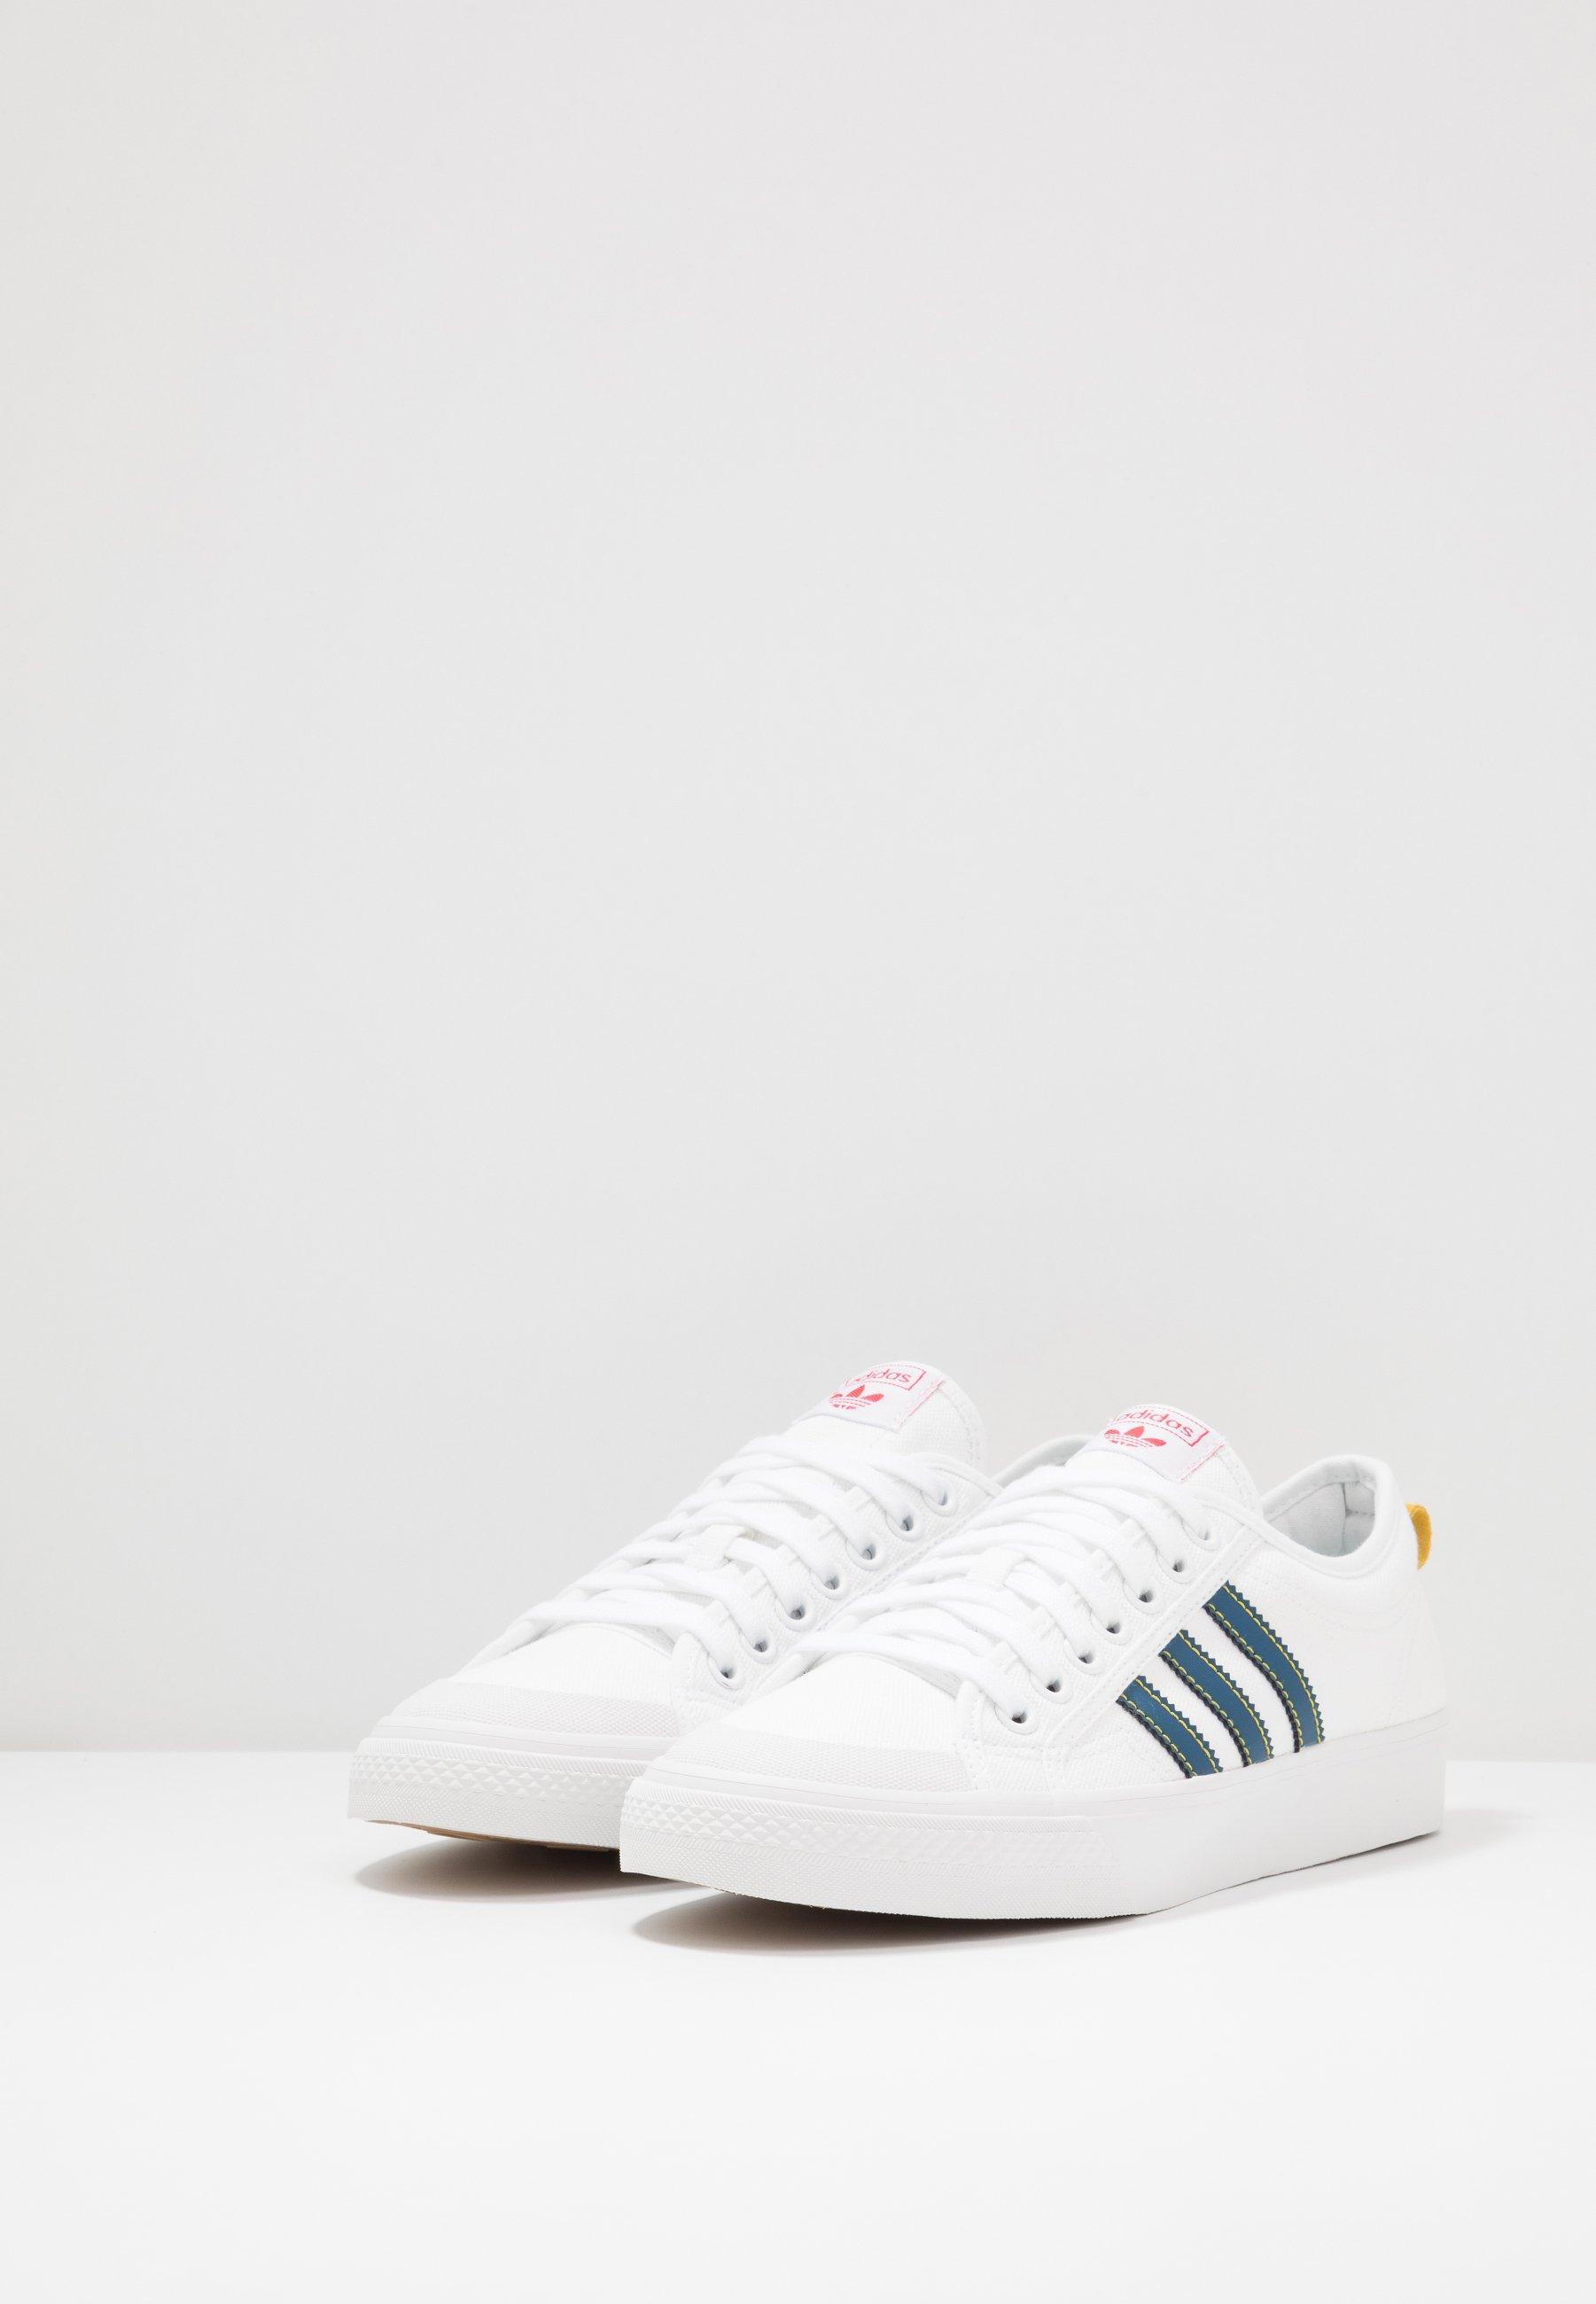 Adidas Originals Nizza - Baskets Basses Footwear White/legend Marine/tribe Yellow